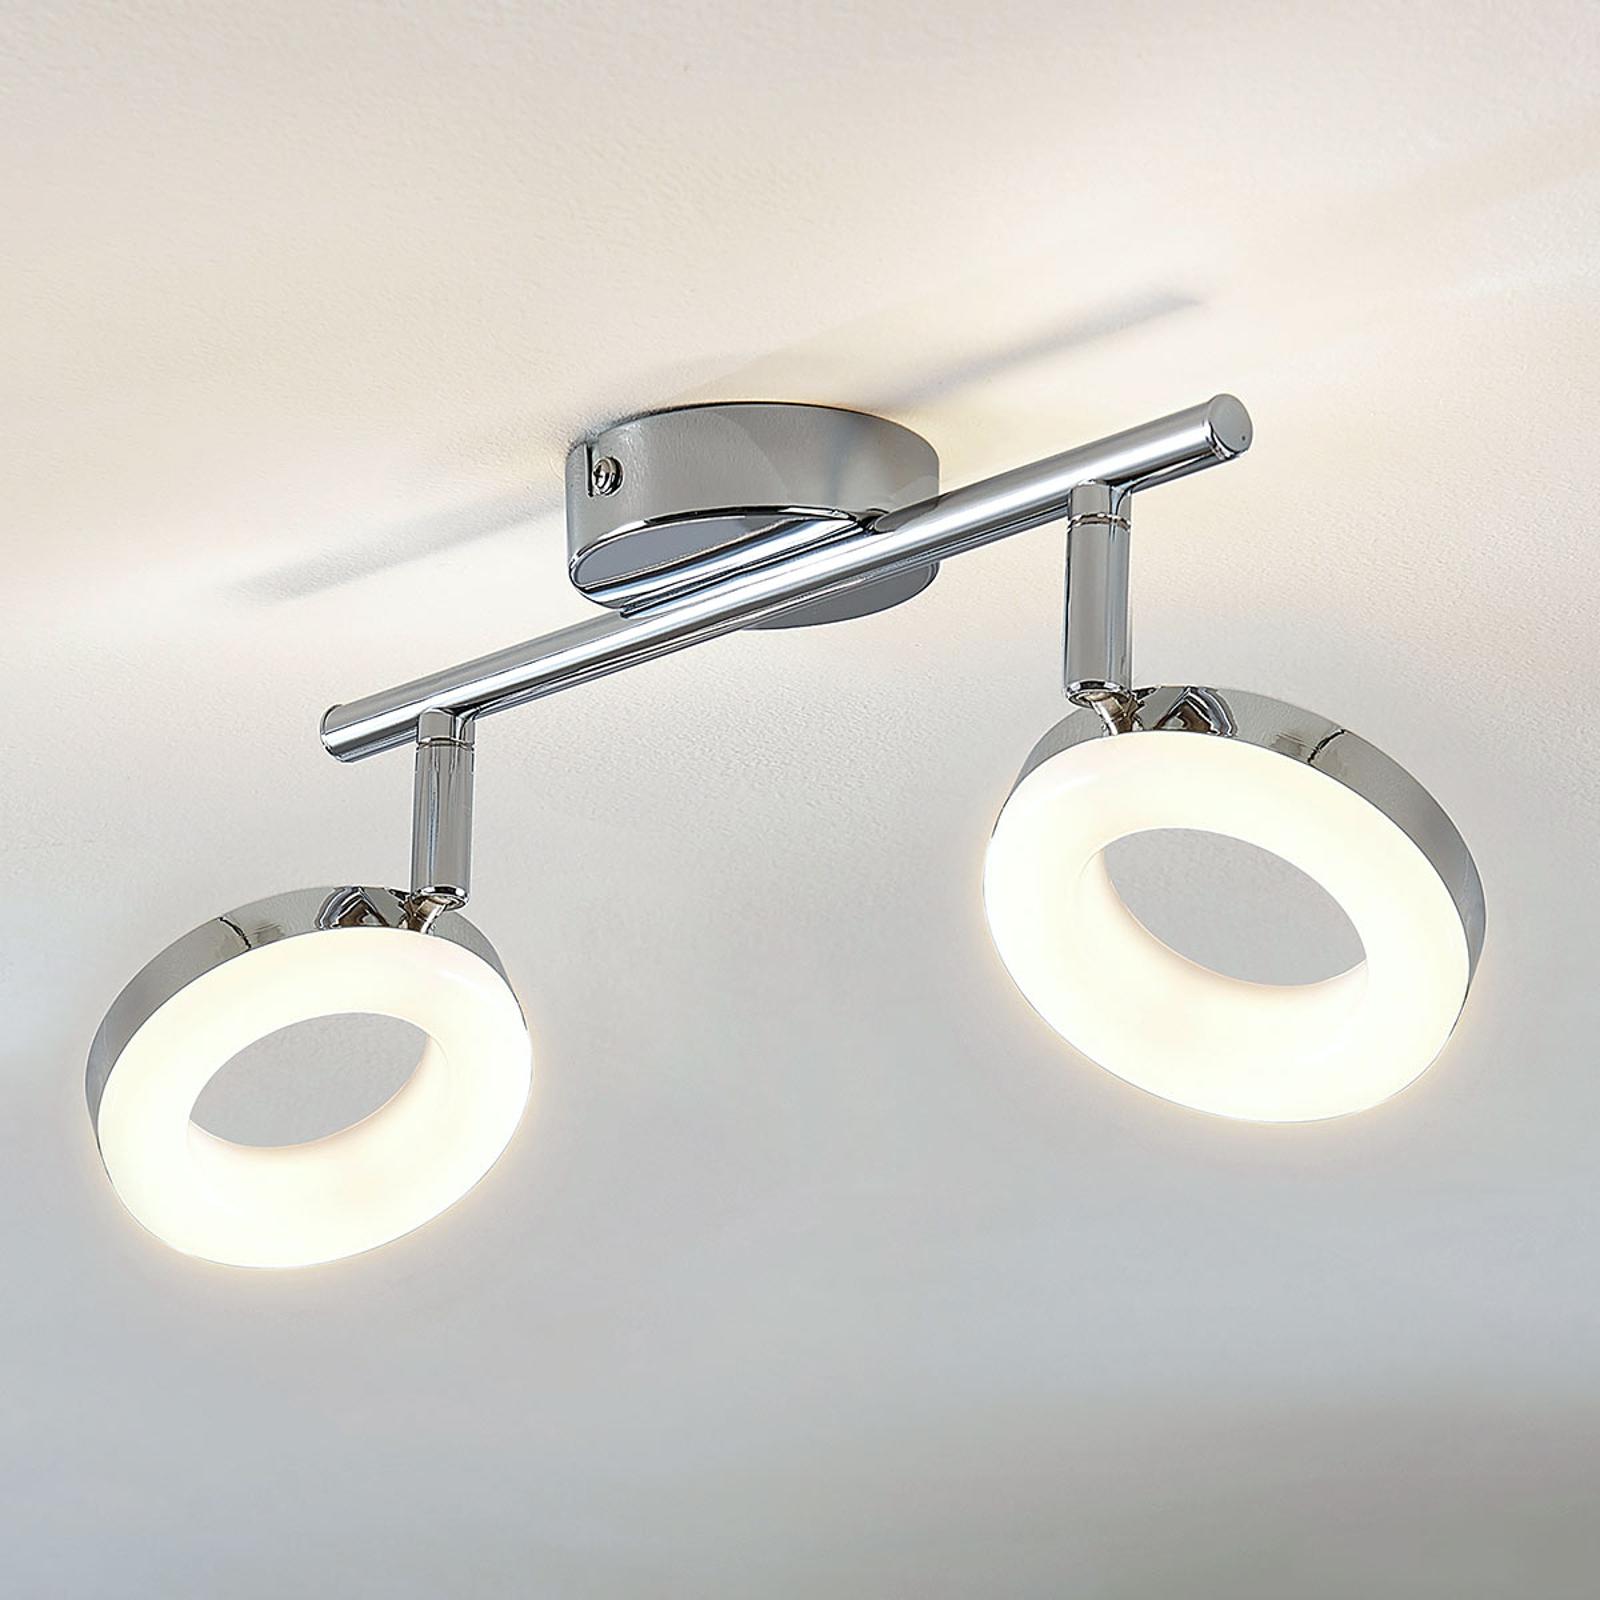 LED-Deckenleuchte Ringo 2-flammig